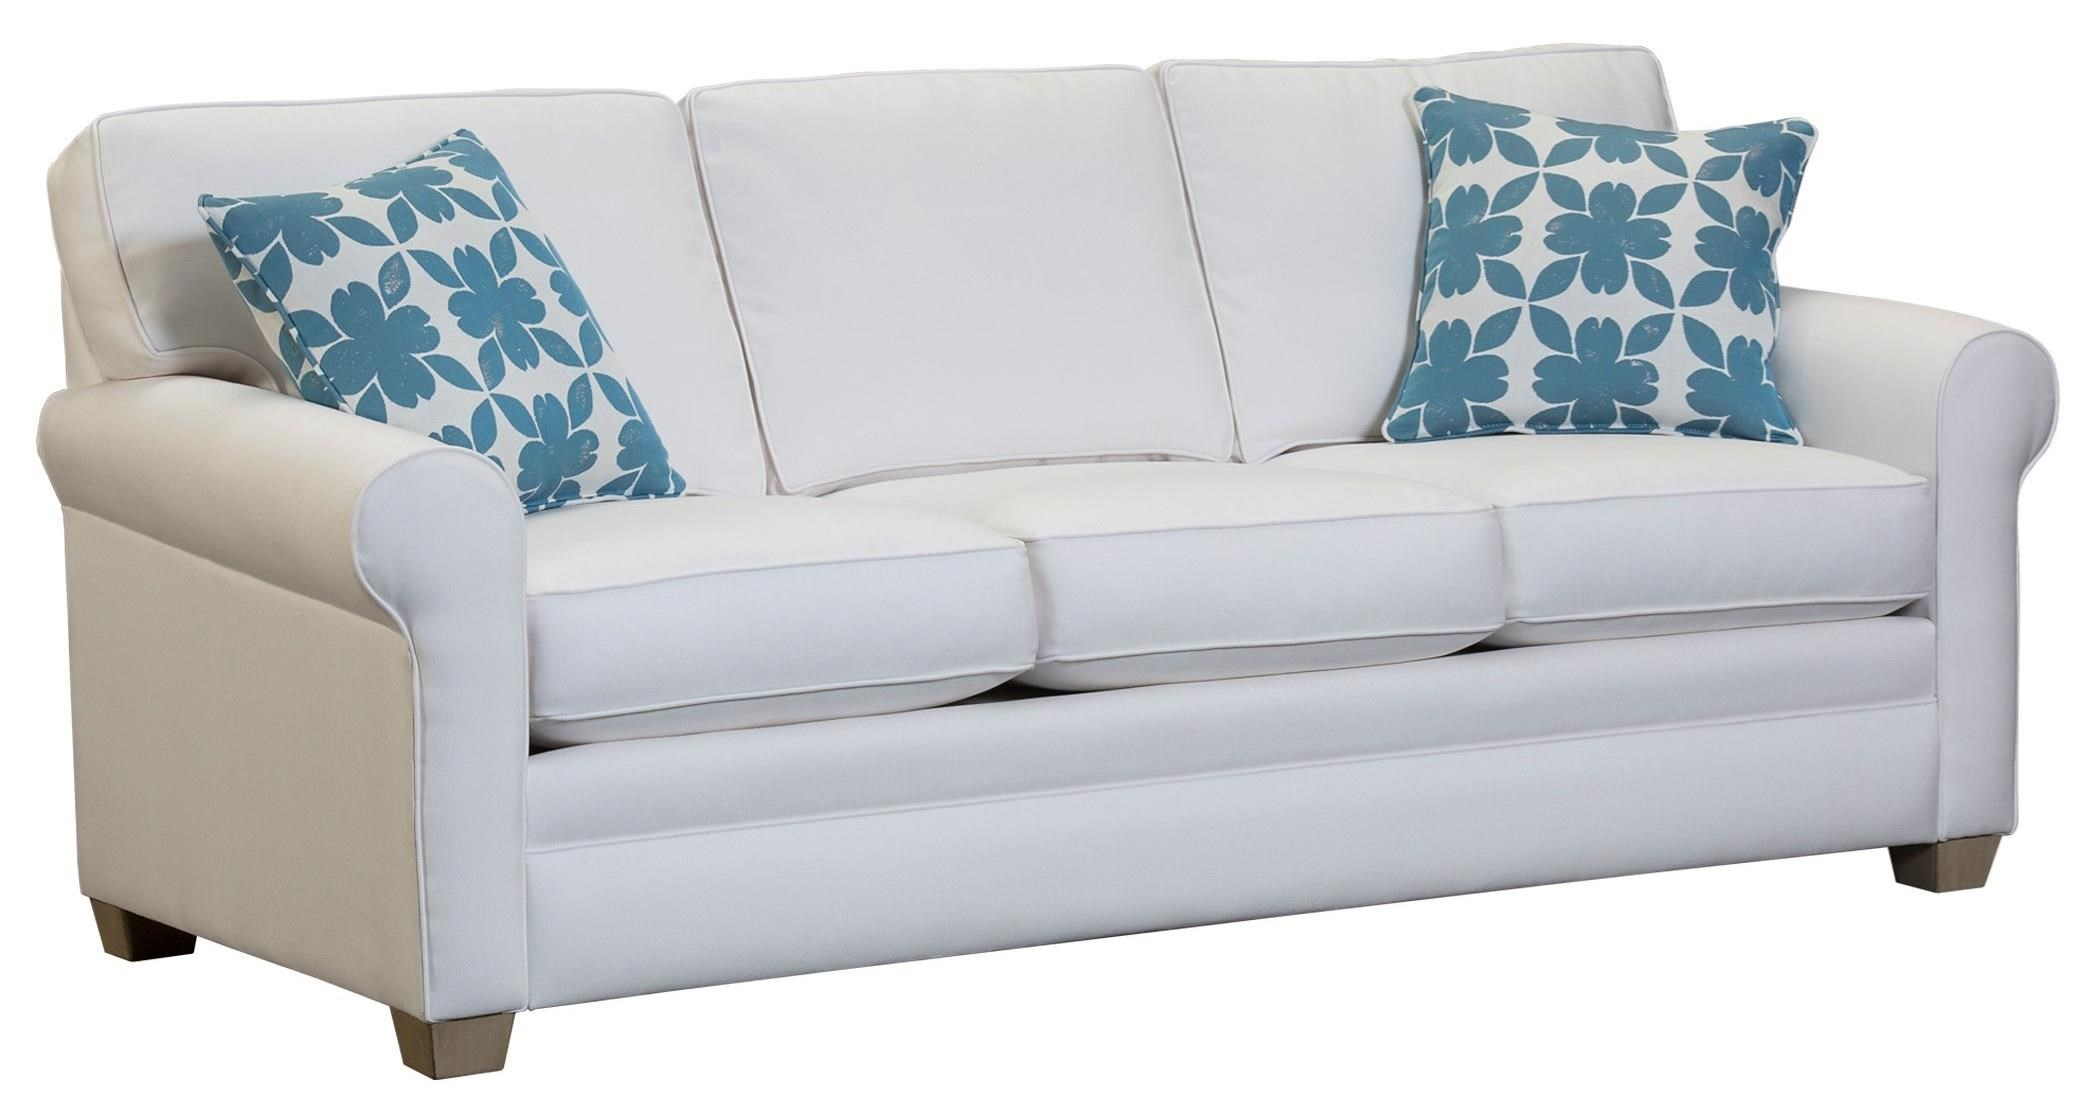 402 Sleeper Sofa by Capris Furniture at Esprit Decor Home Furnishings